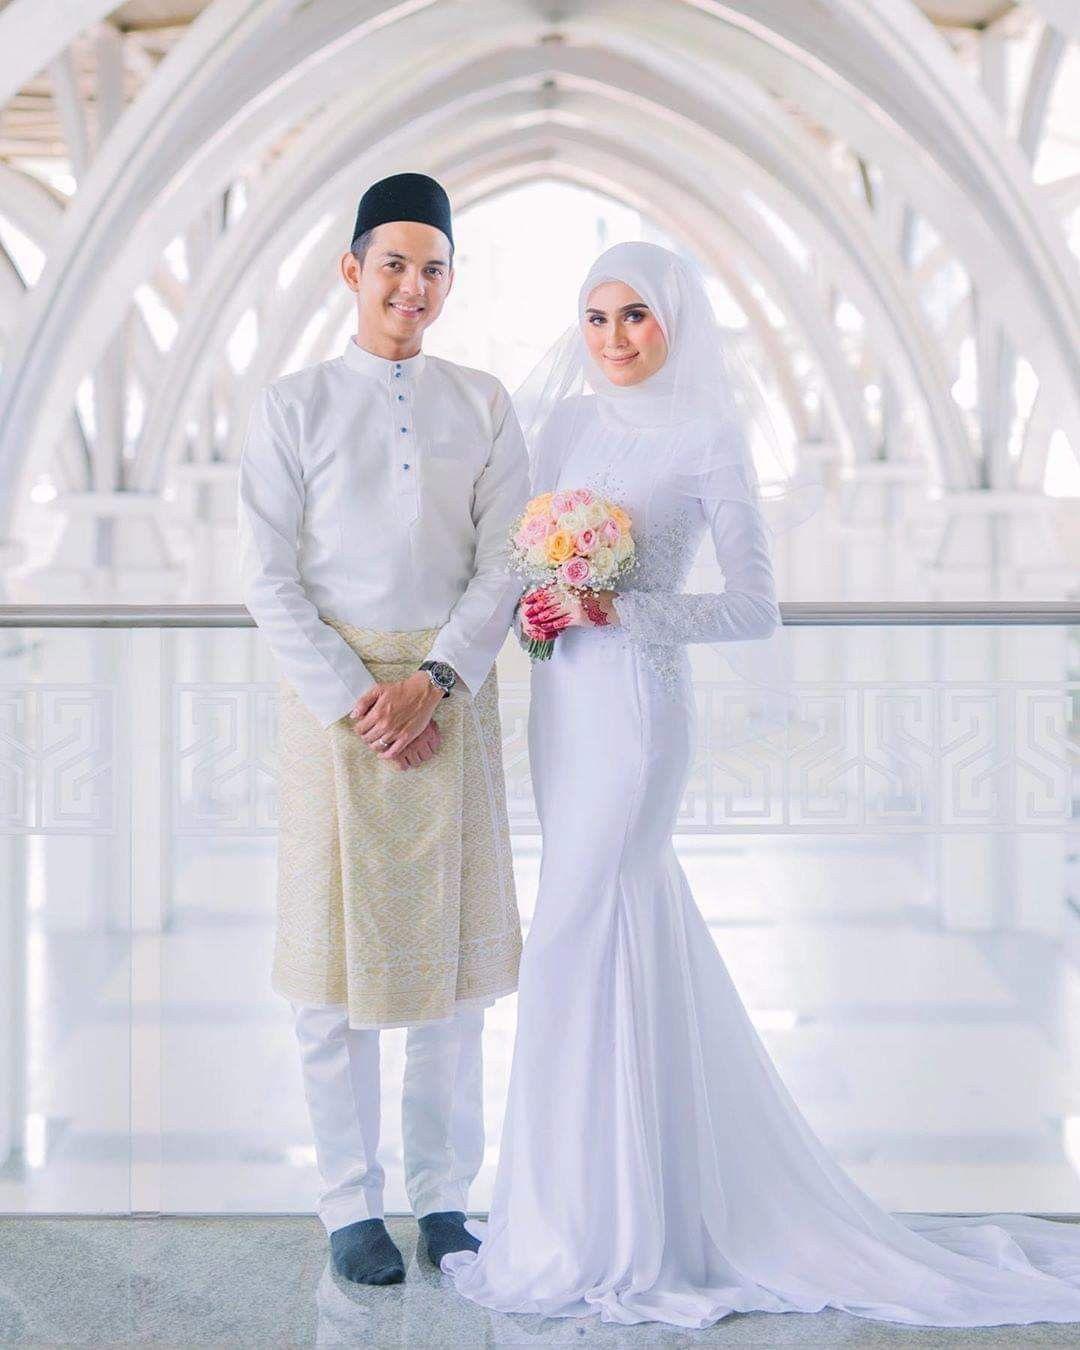 Wedding Dress Gaun Pengantin Muslimah 10 - ADDICFASHION